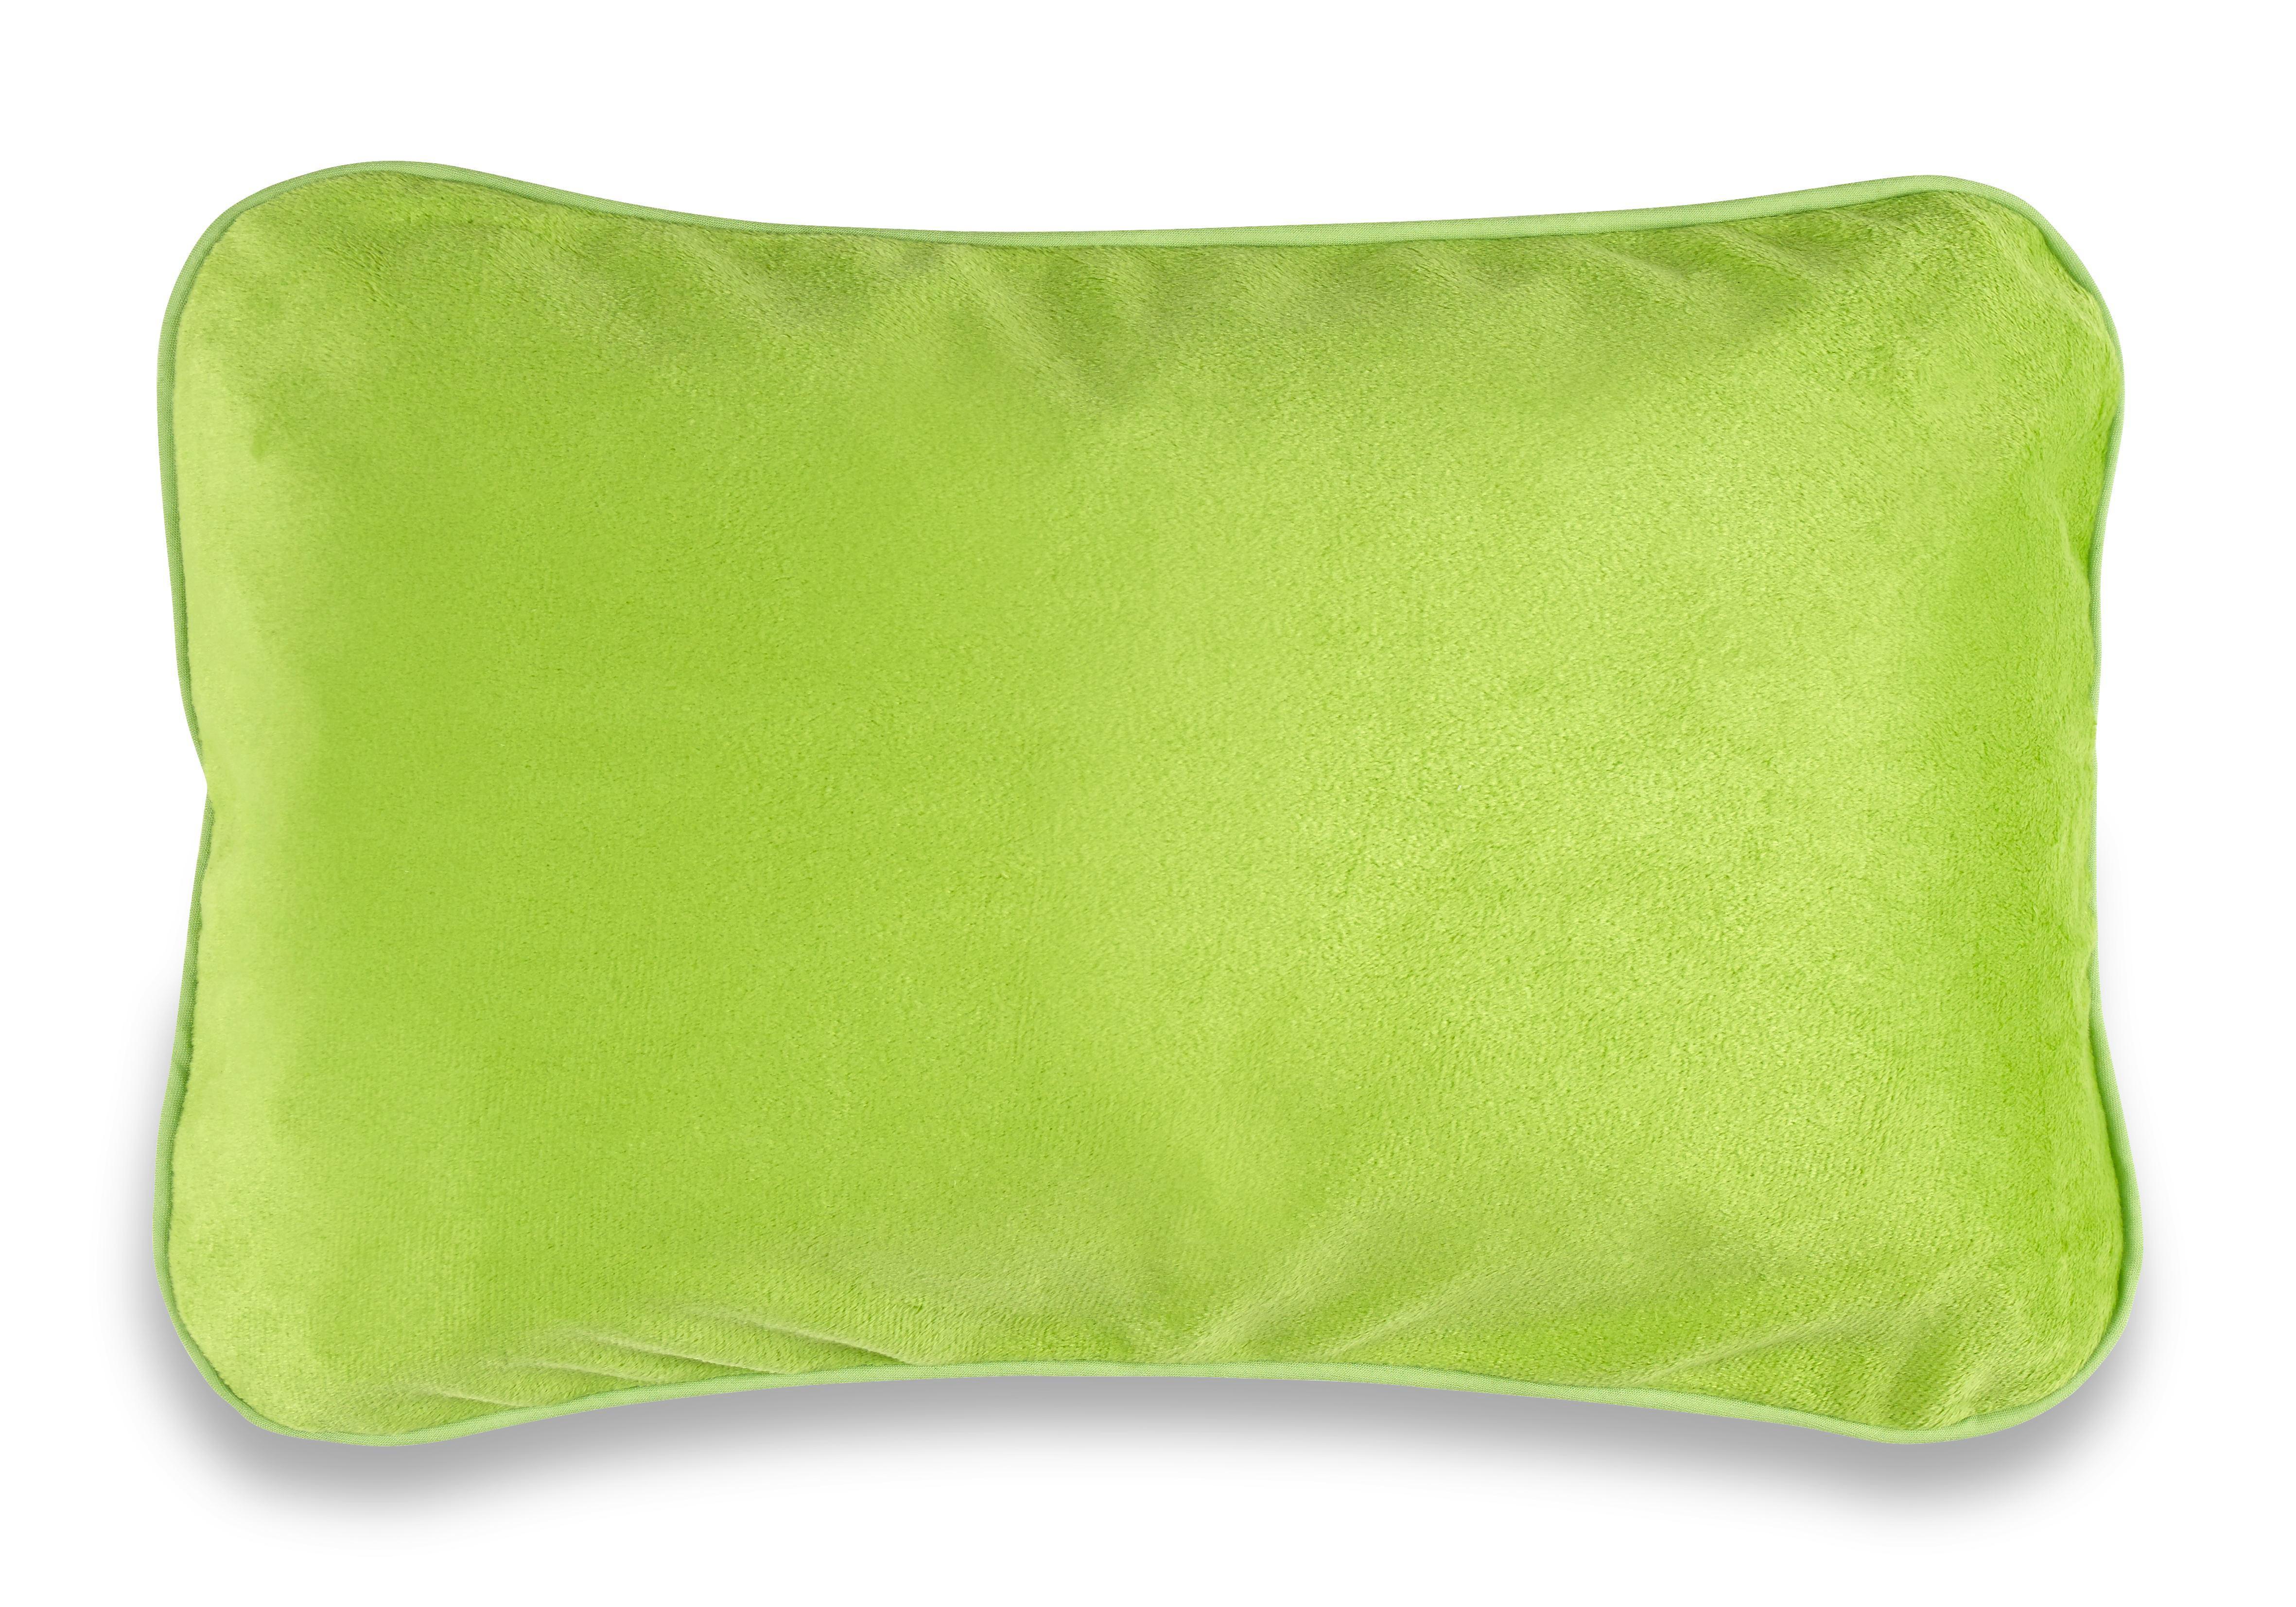 Reisekissen Sandra, ca. 40x25cm - Petrol/Grau, Kunststoff/Textil (40/25cm) - MÖMAX modern living